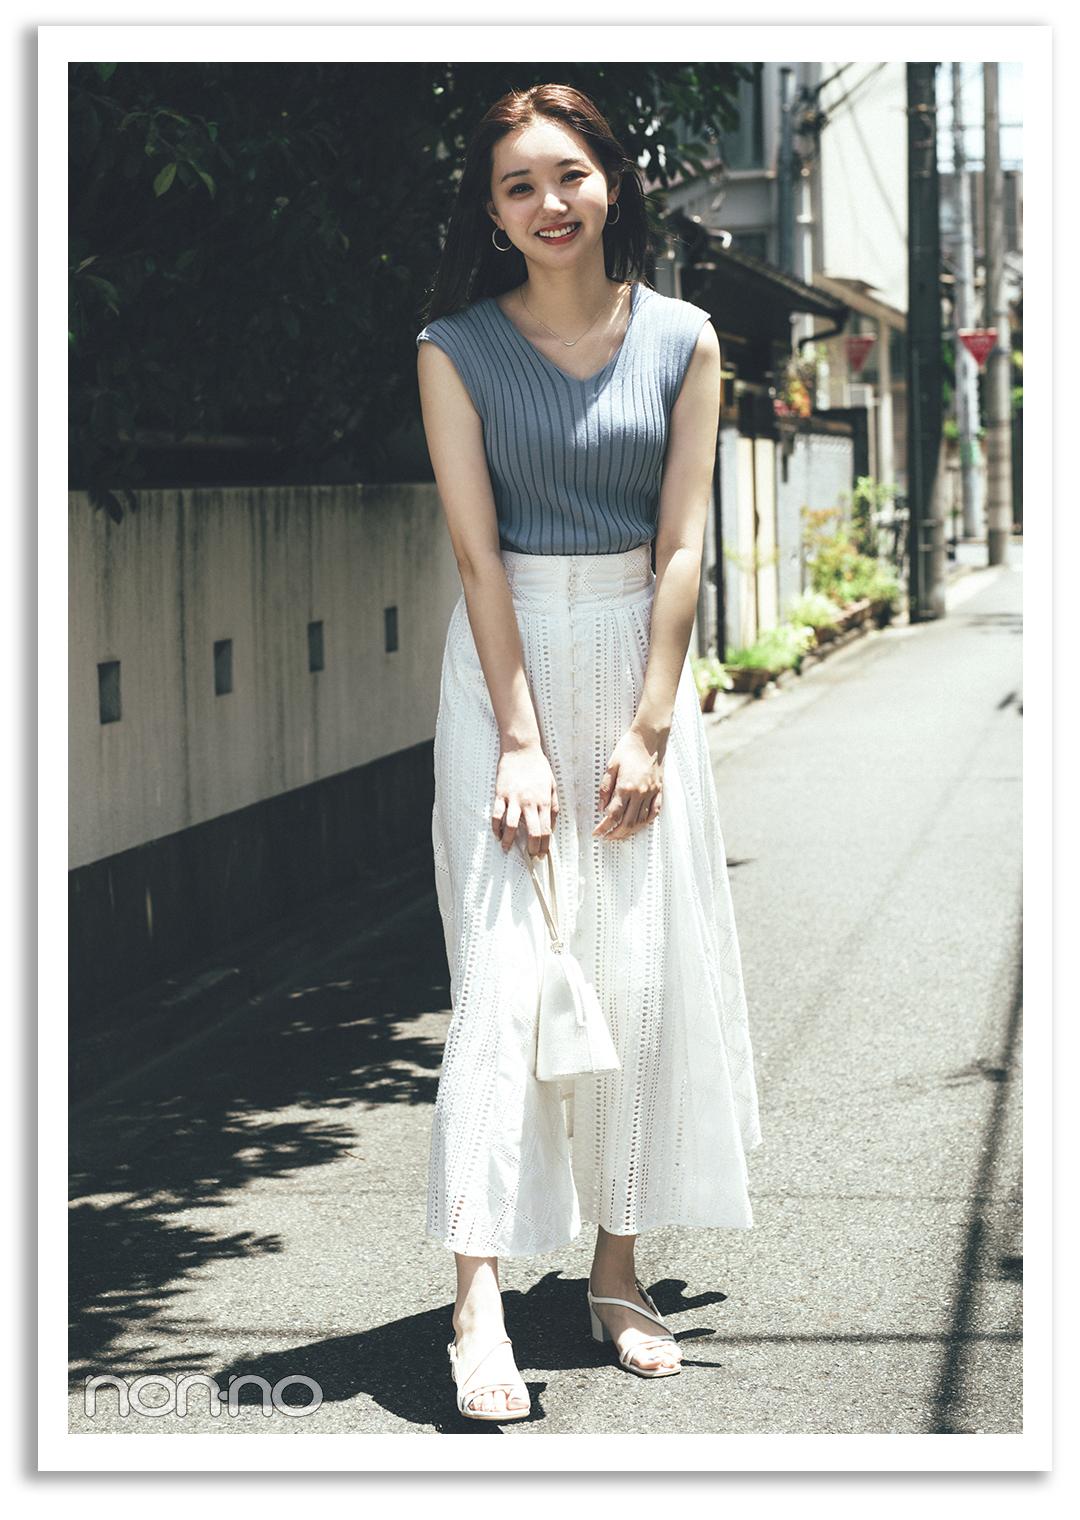 PATTERN4) 白ロンスカにはVネックの 水色ノースリですっきりシャープに♡ 江野沢愛美